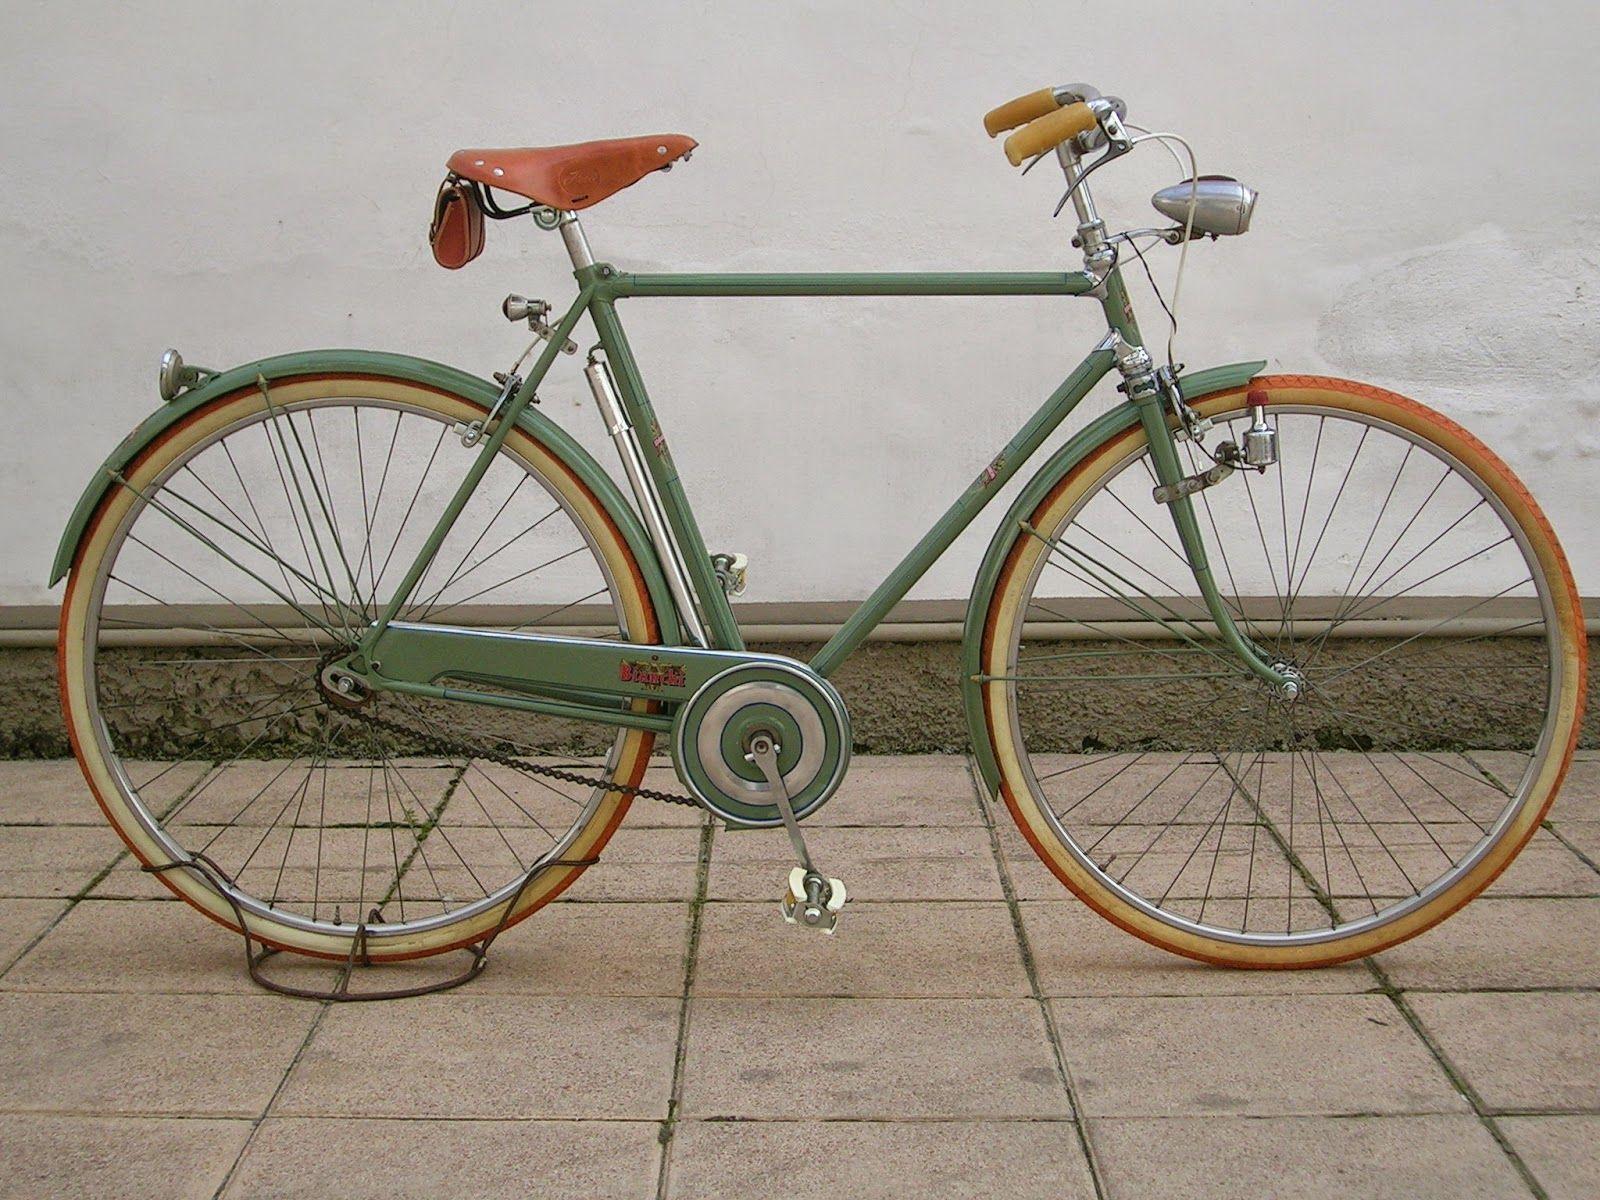 Biciclette Epoca By Vallo64 Bianchi Selvino 1952 Bike Stuff